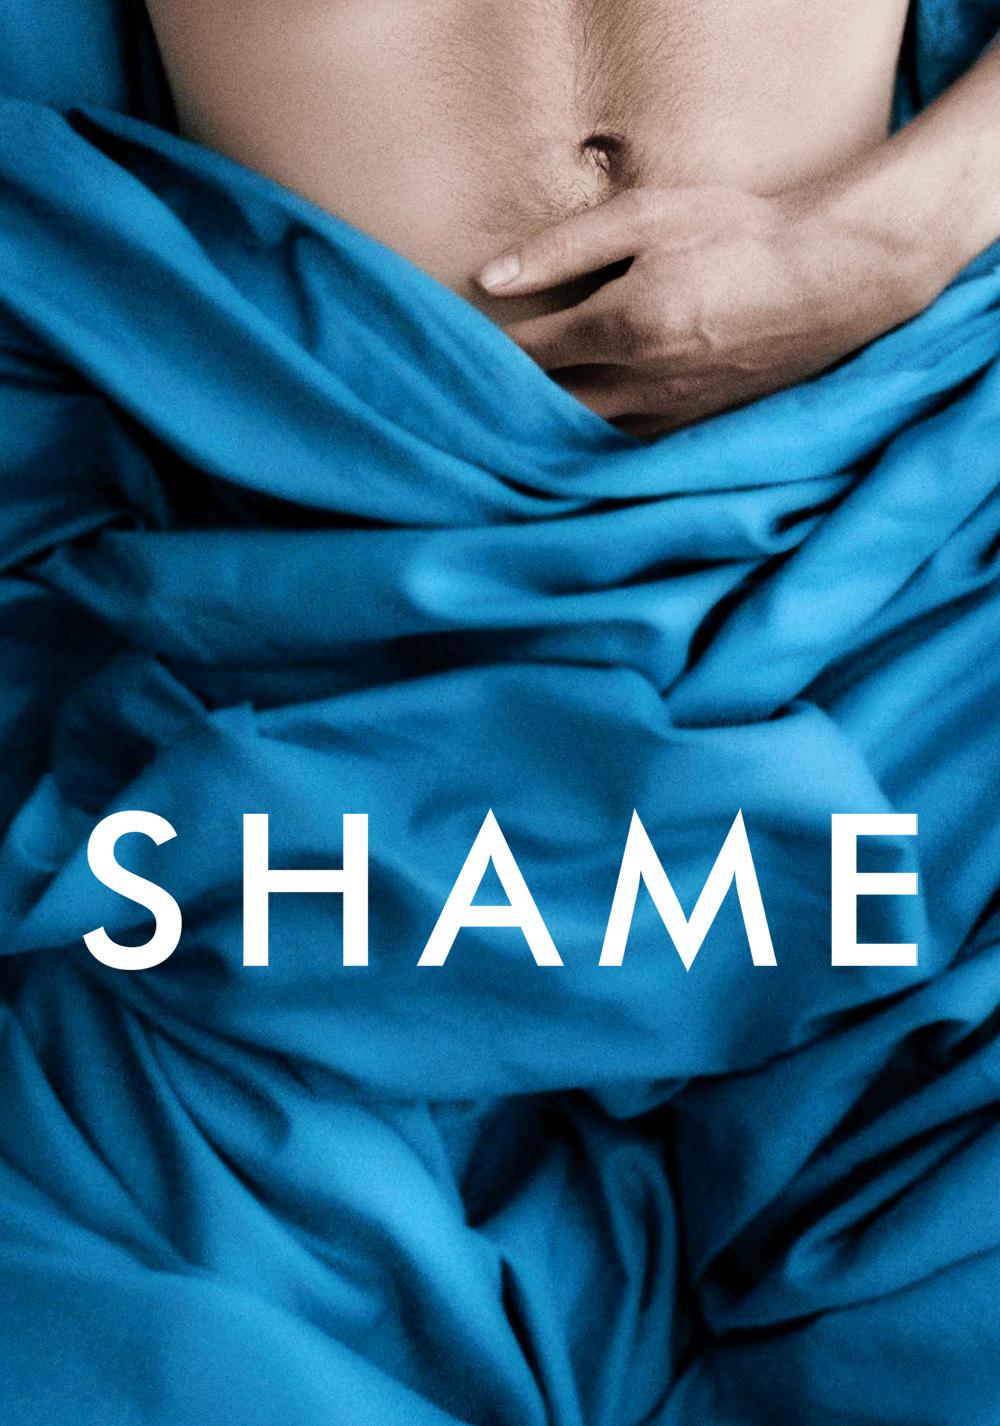 Film Shame